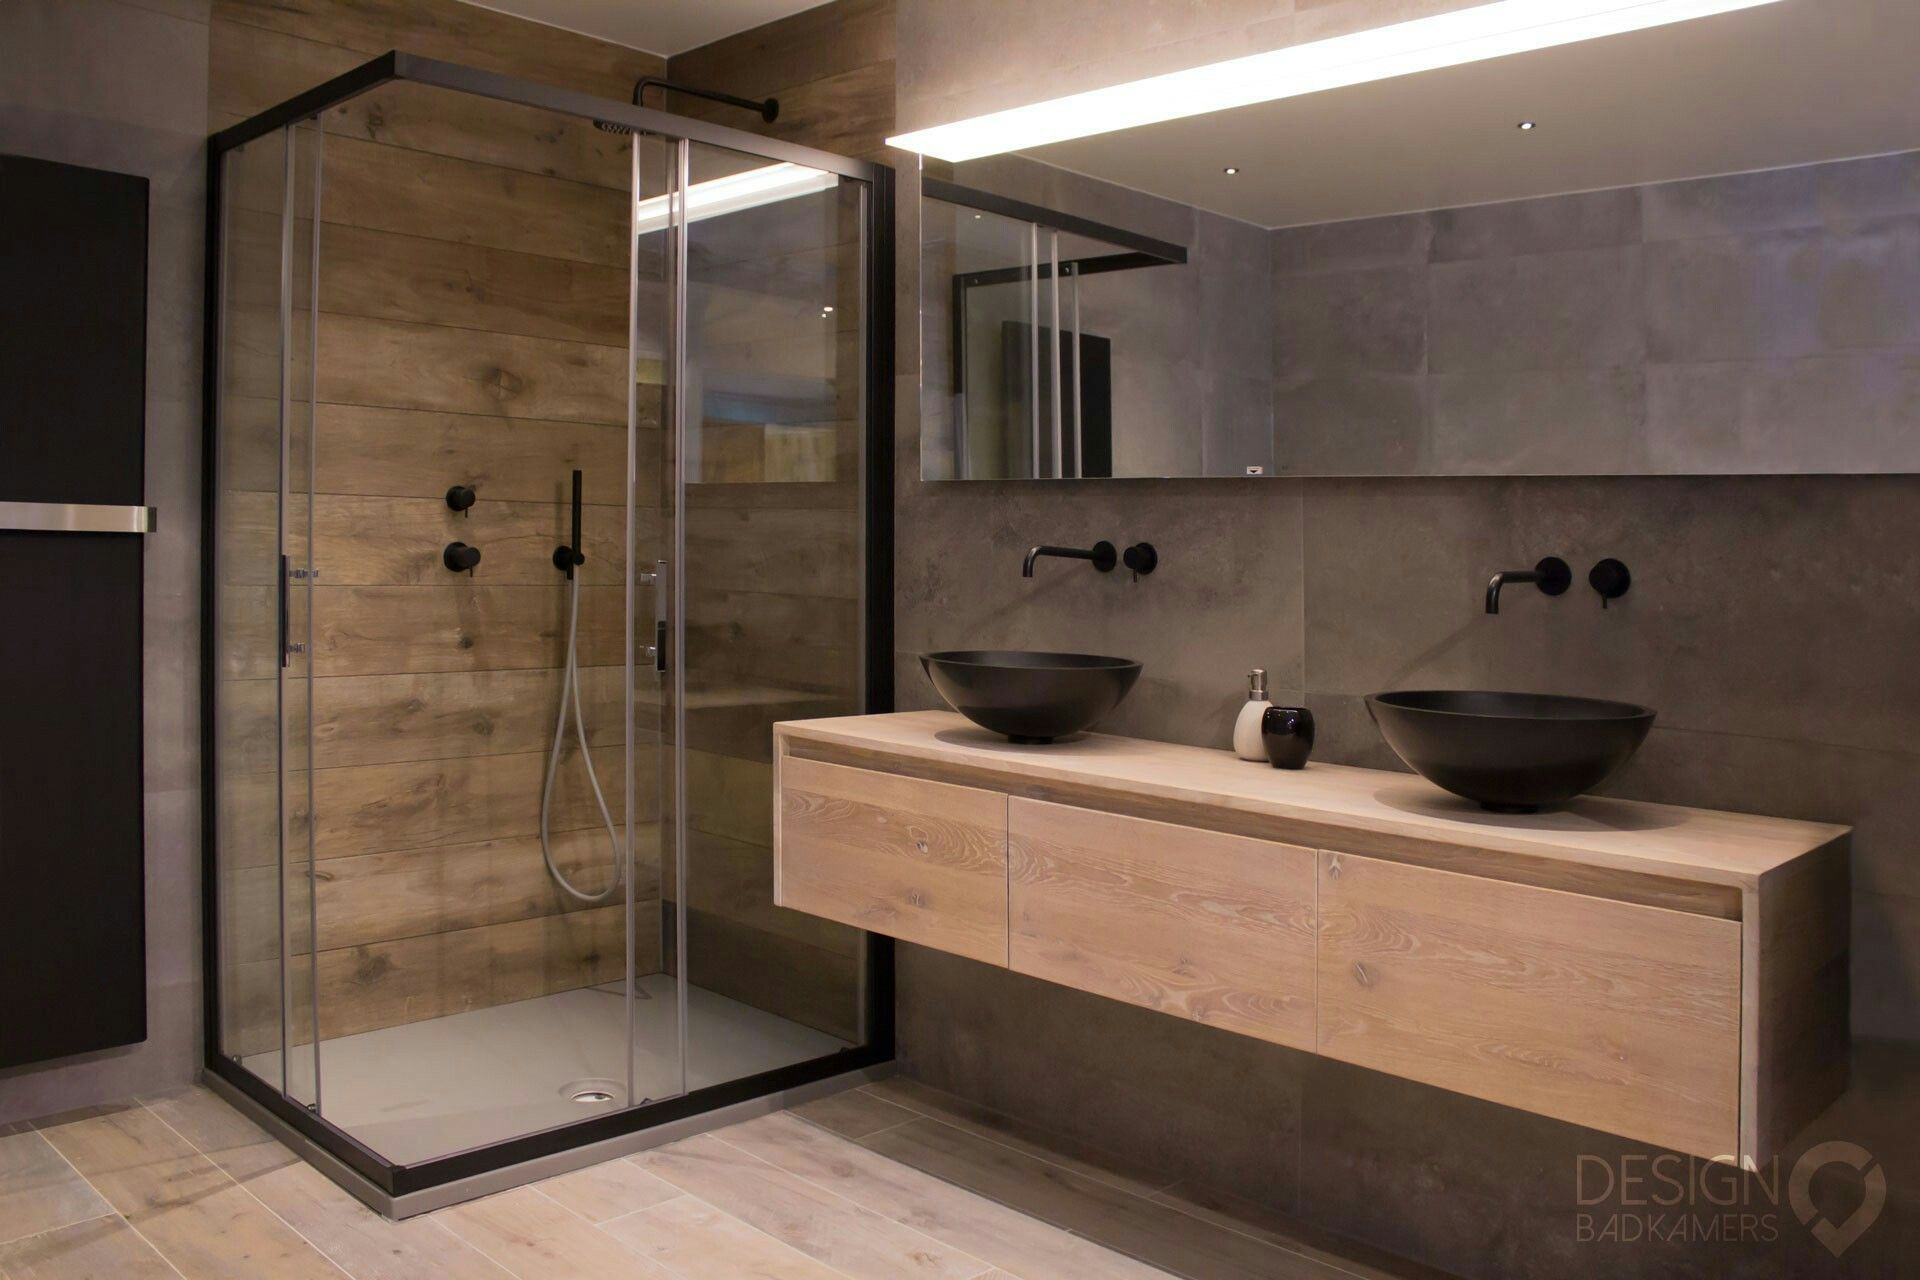 En Suite Bathrooms Rustic: Pin By Travis Douglas On Improvements